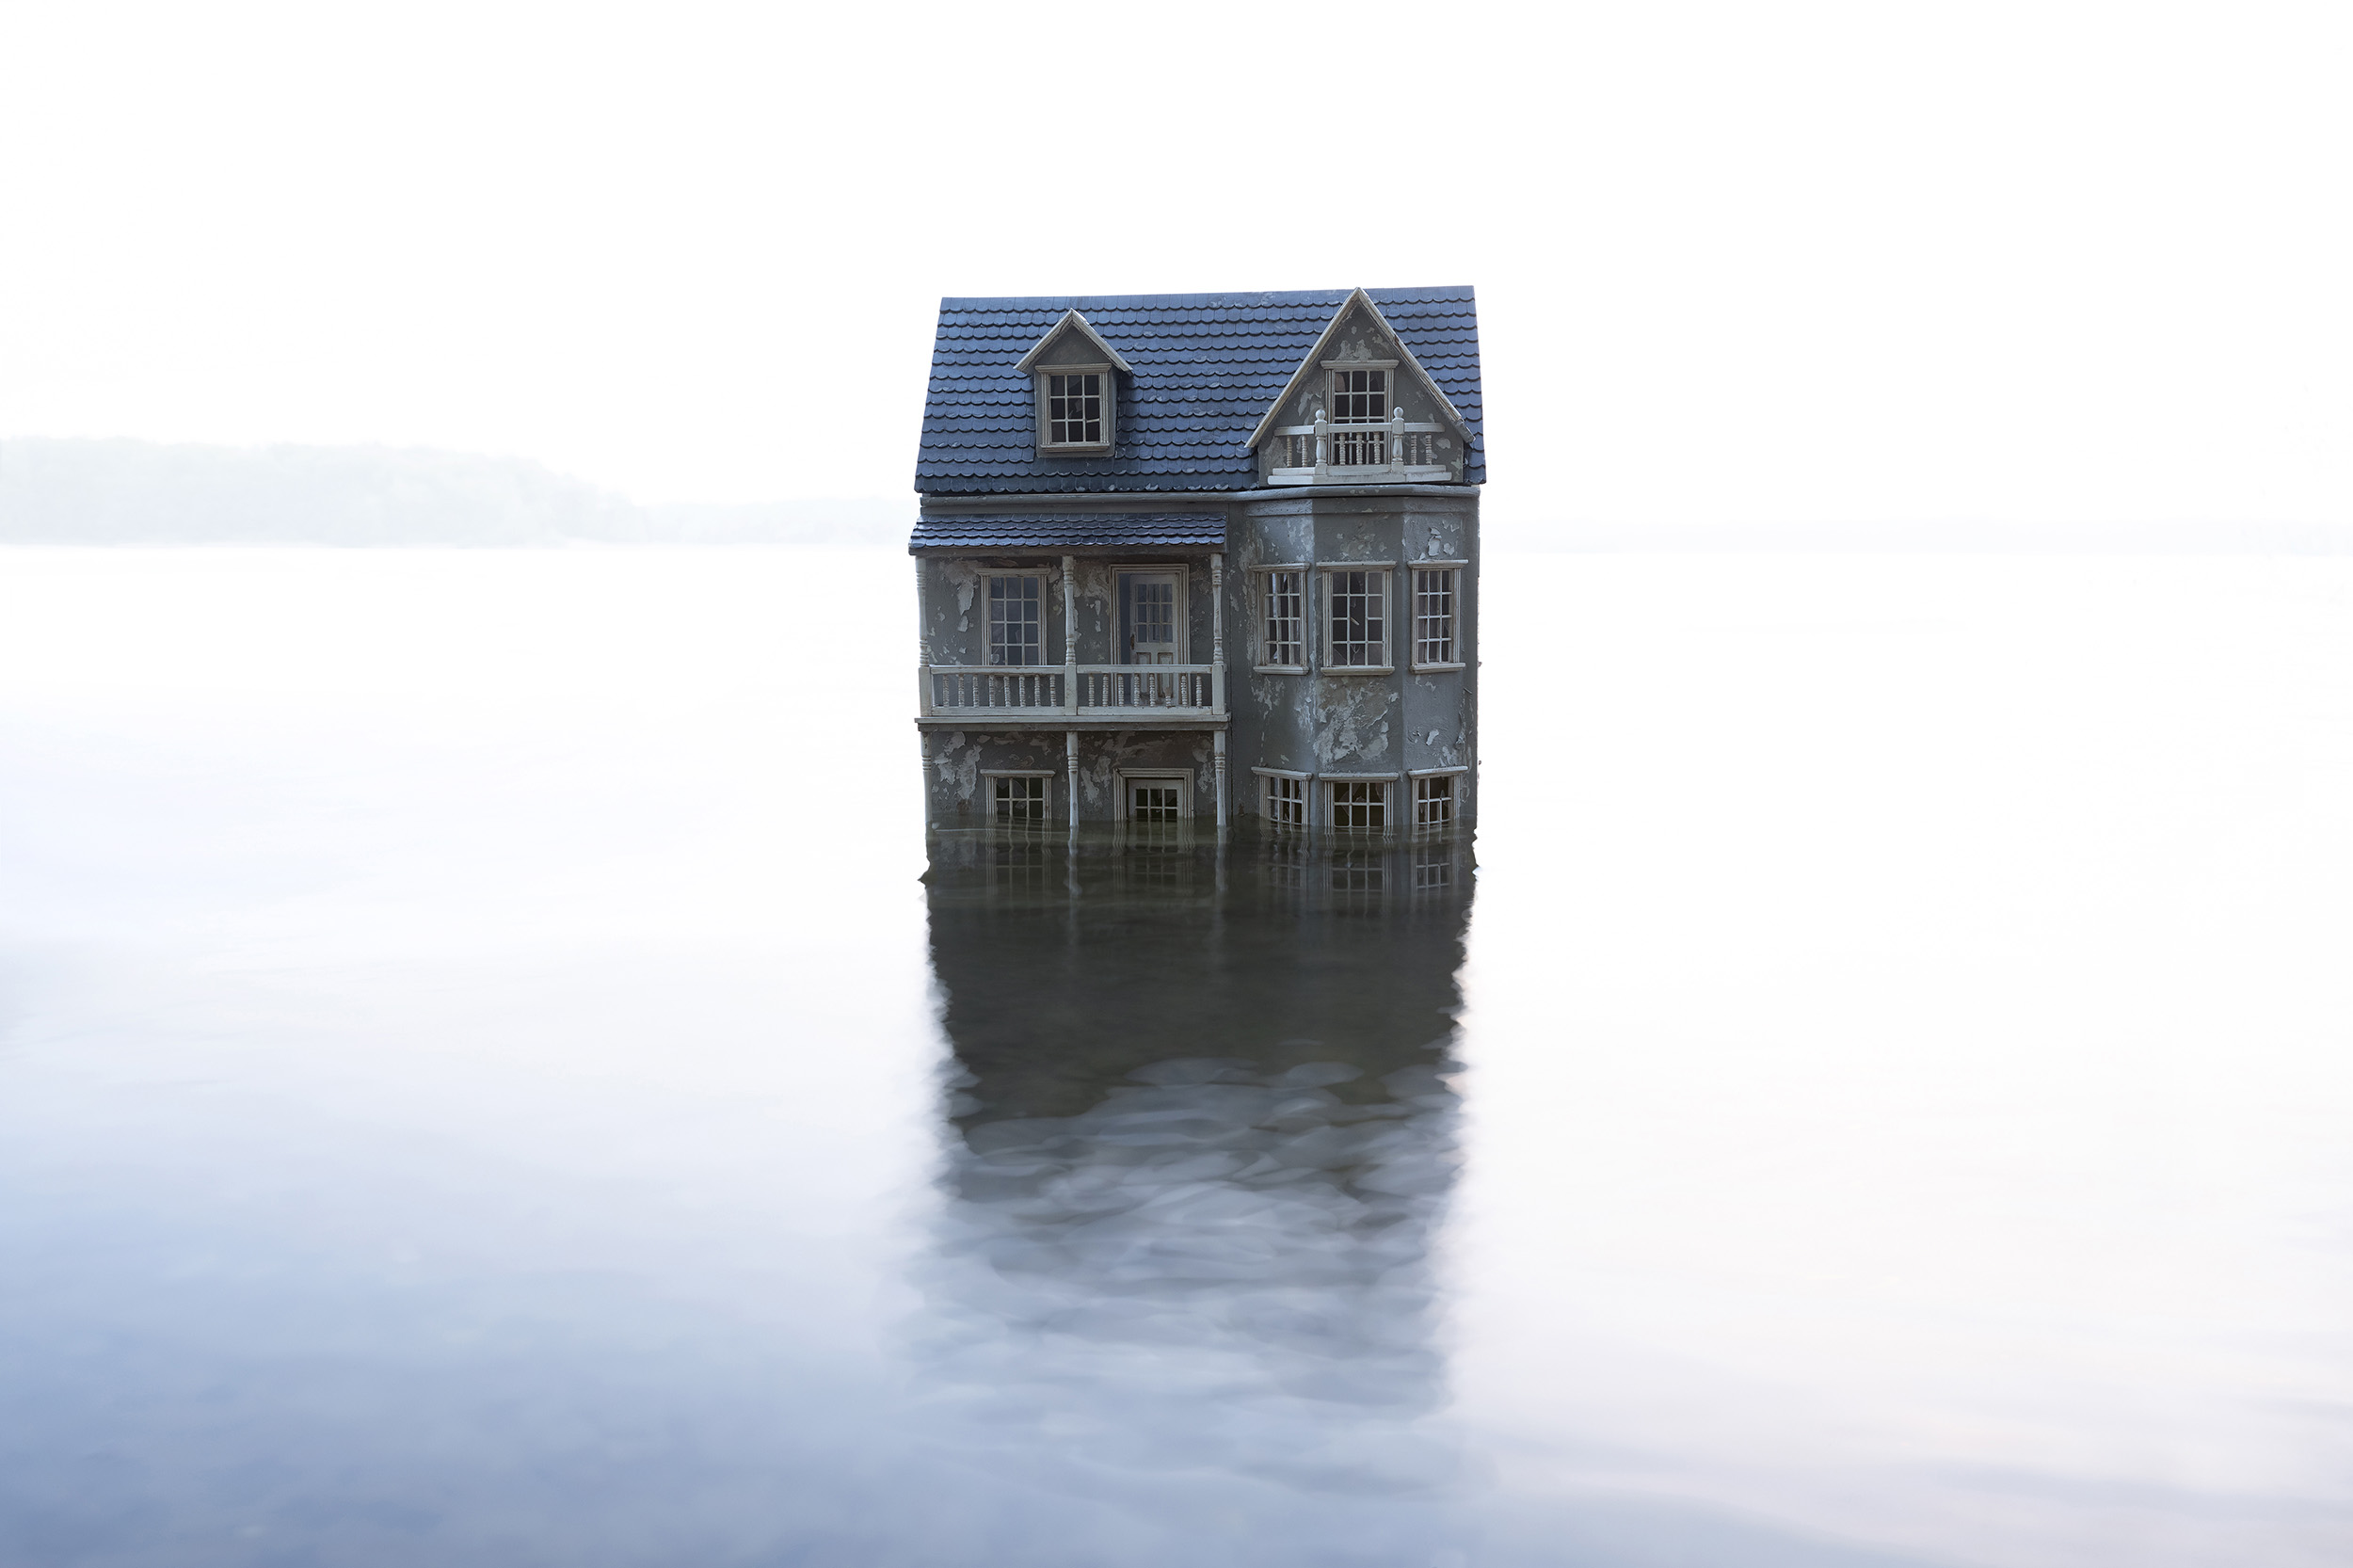 Deluge,  2019 113 x 170 cm